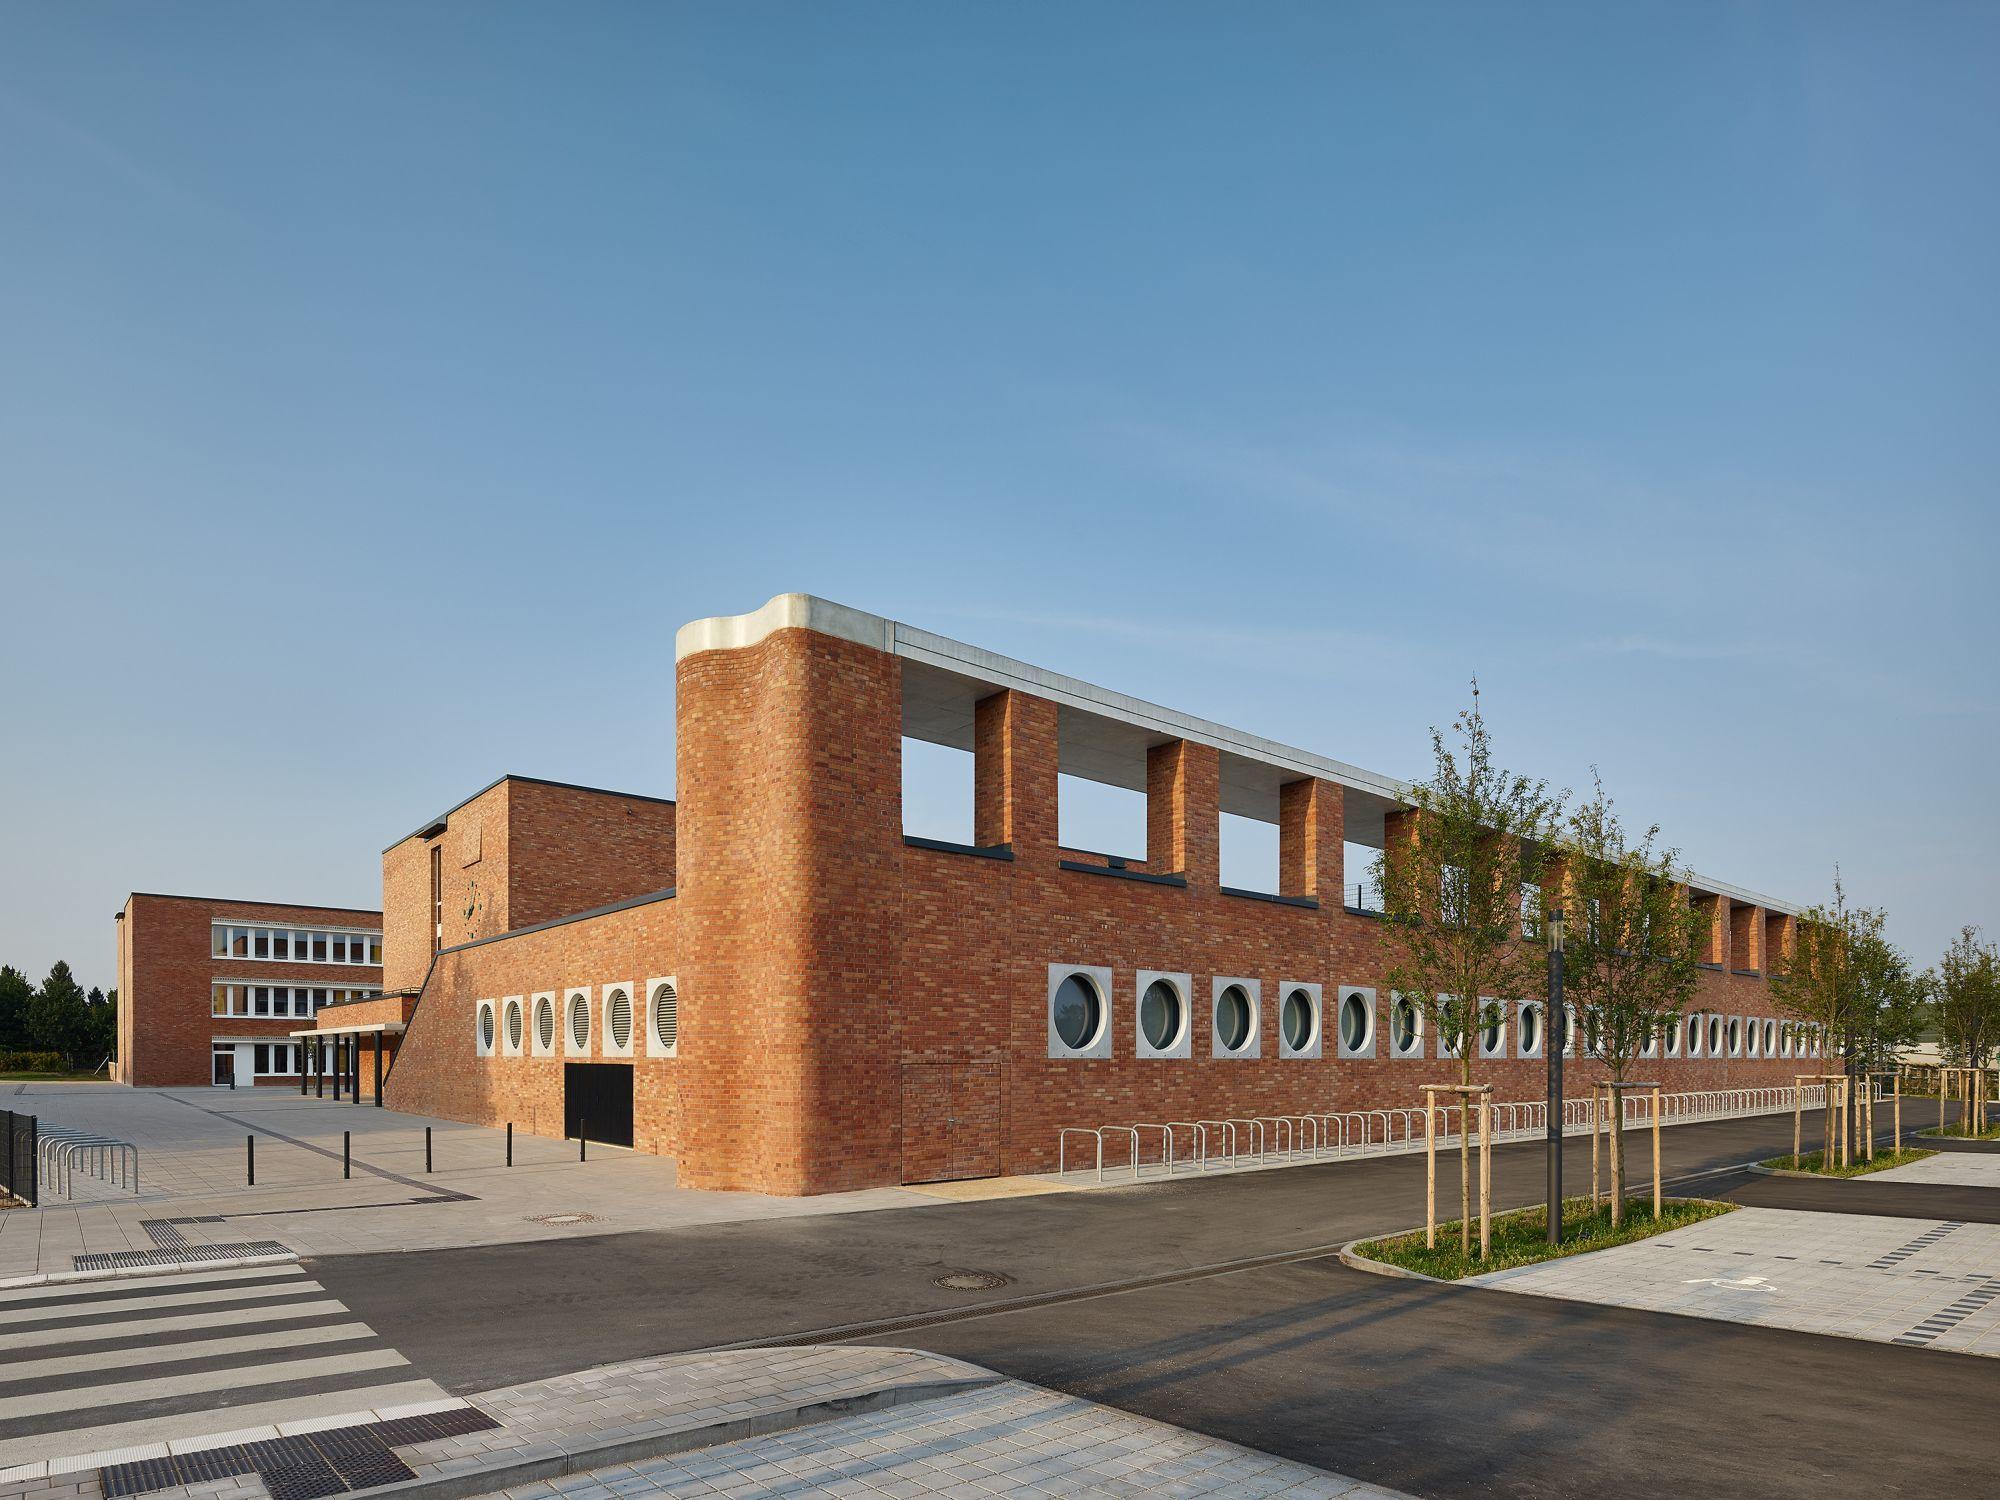 Architekten Nürnberg johann pachelbel realschule und staatliche fachoberschule ii